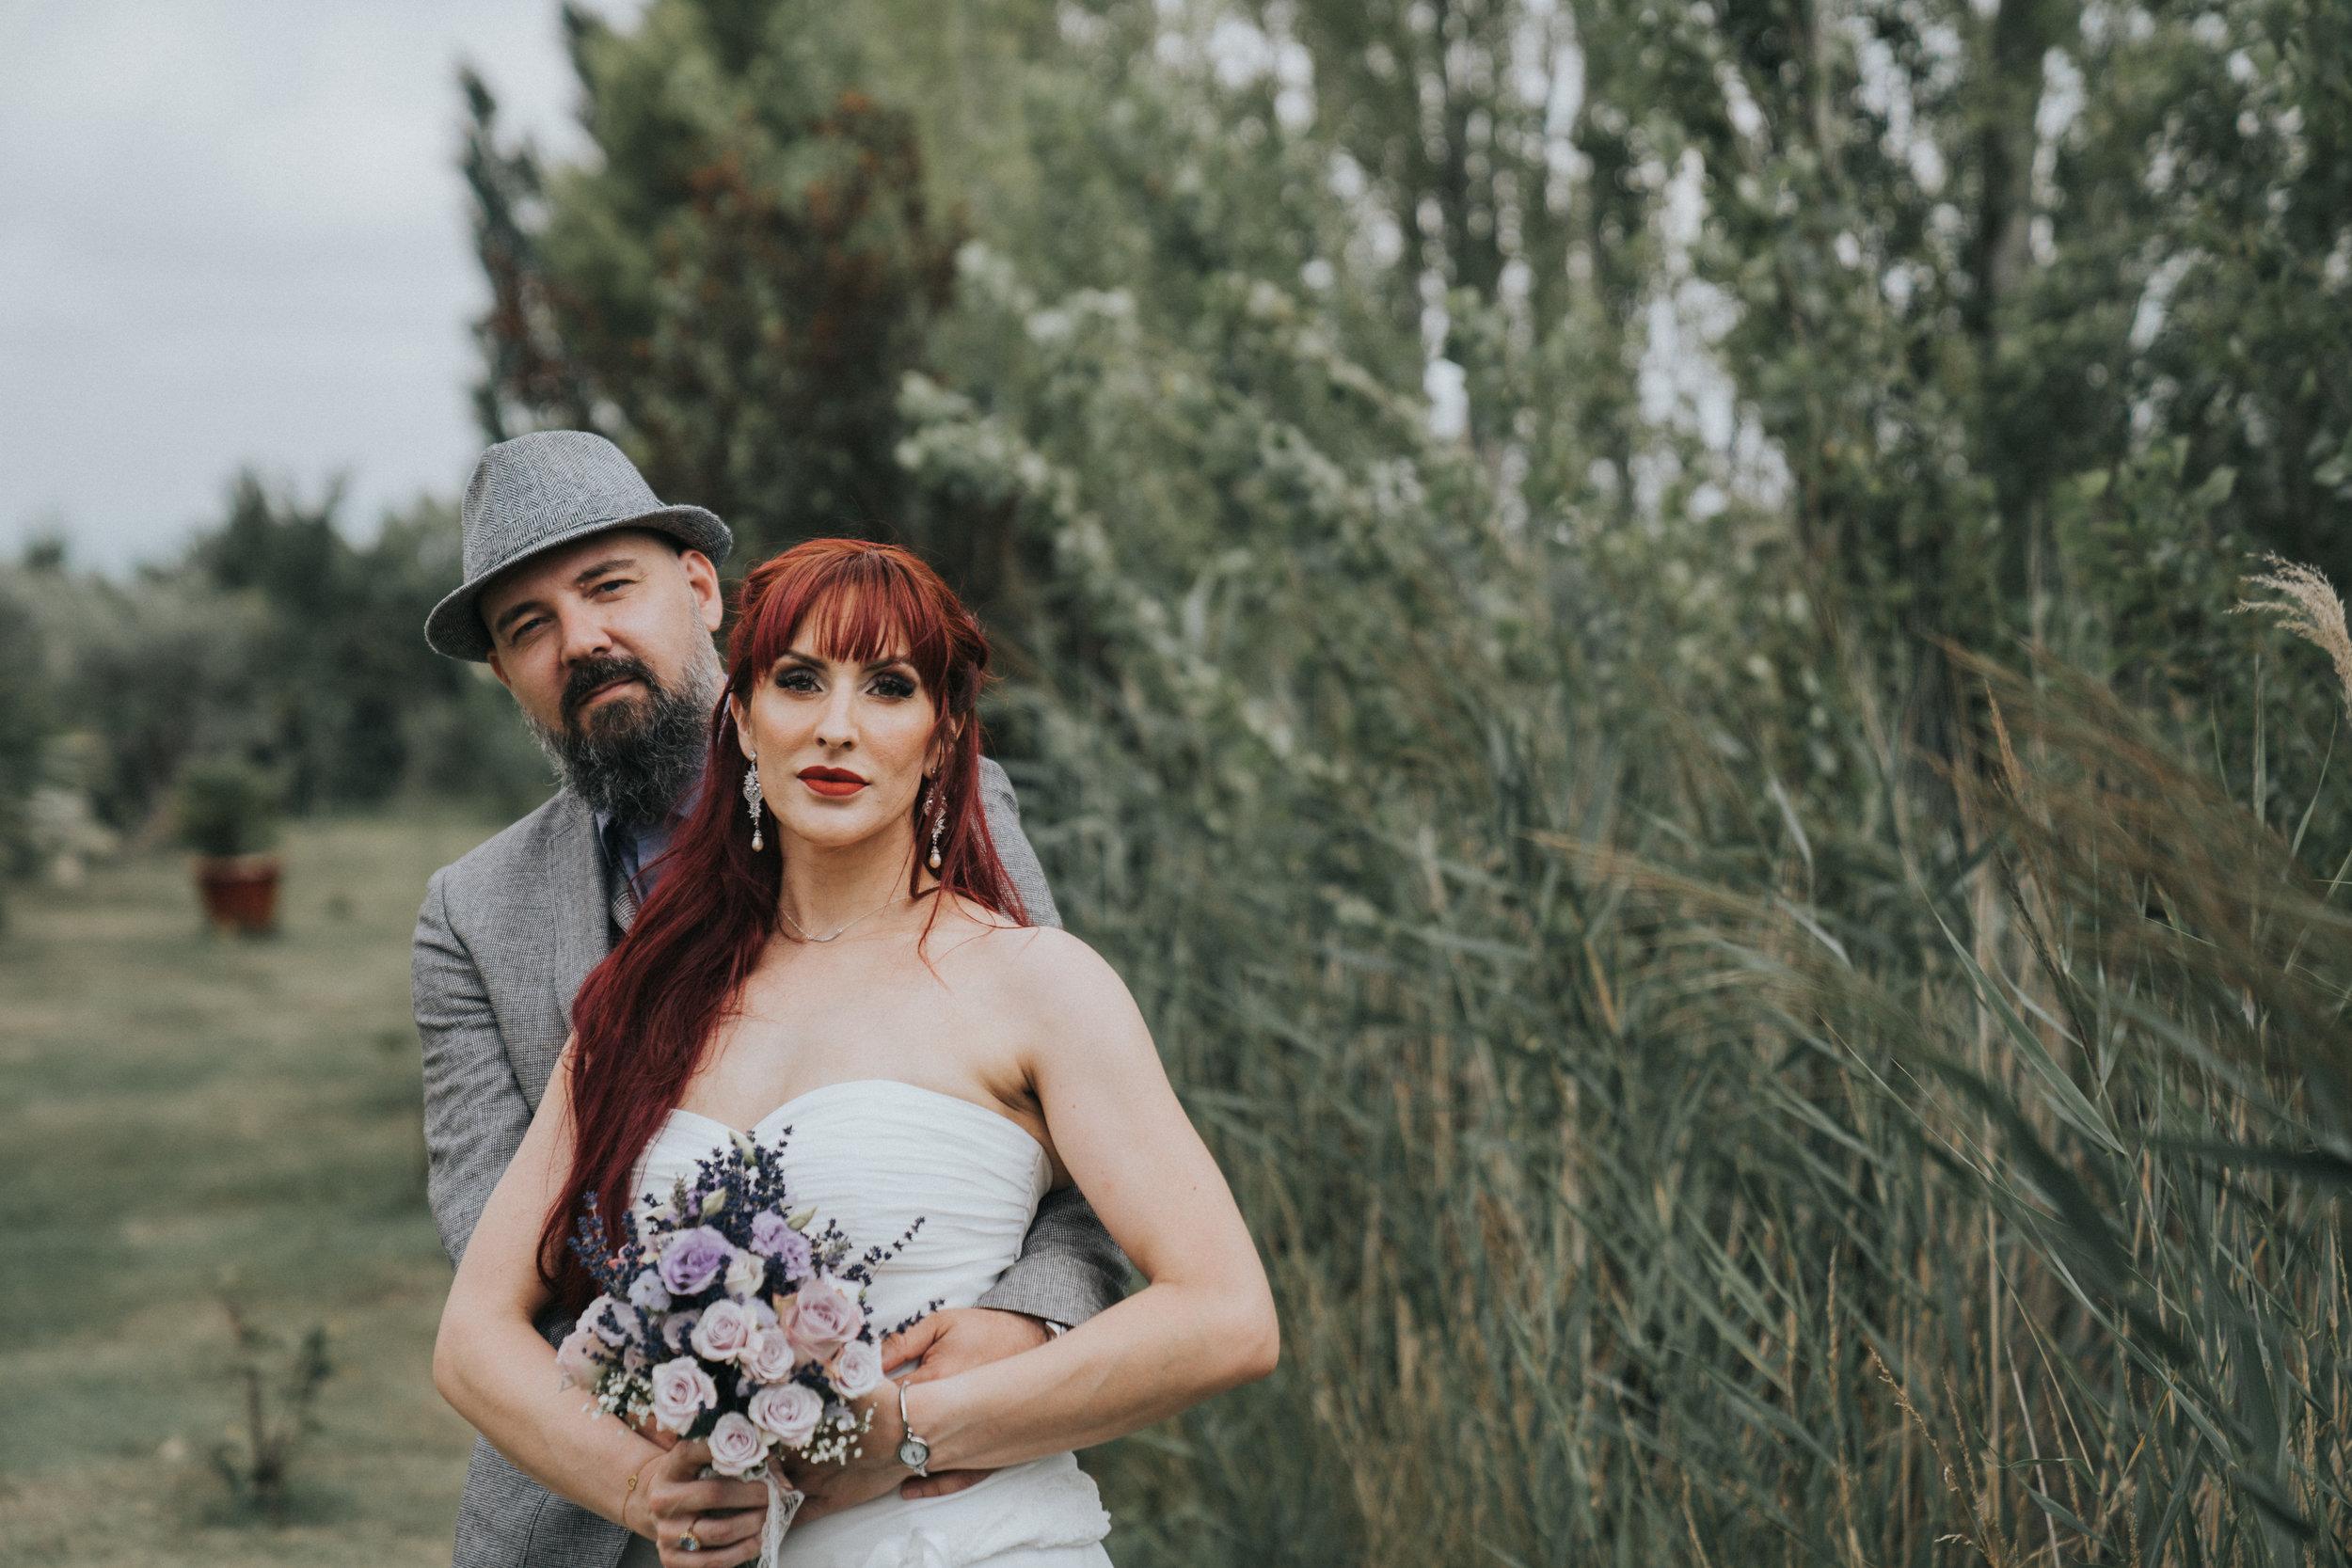 french-farmhouse-wedding-photography-carcassonne-france-31